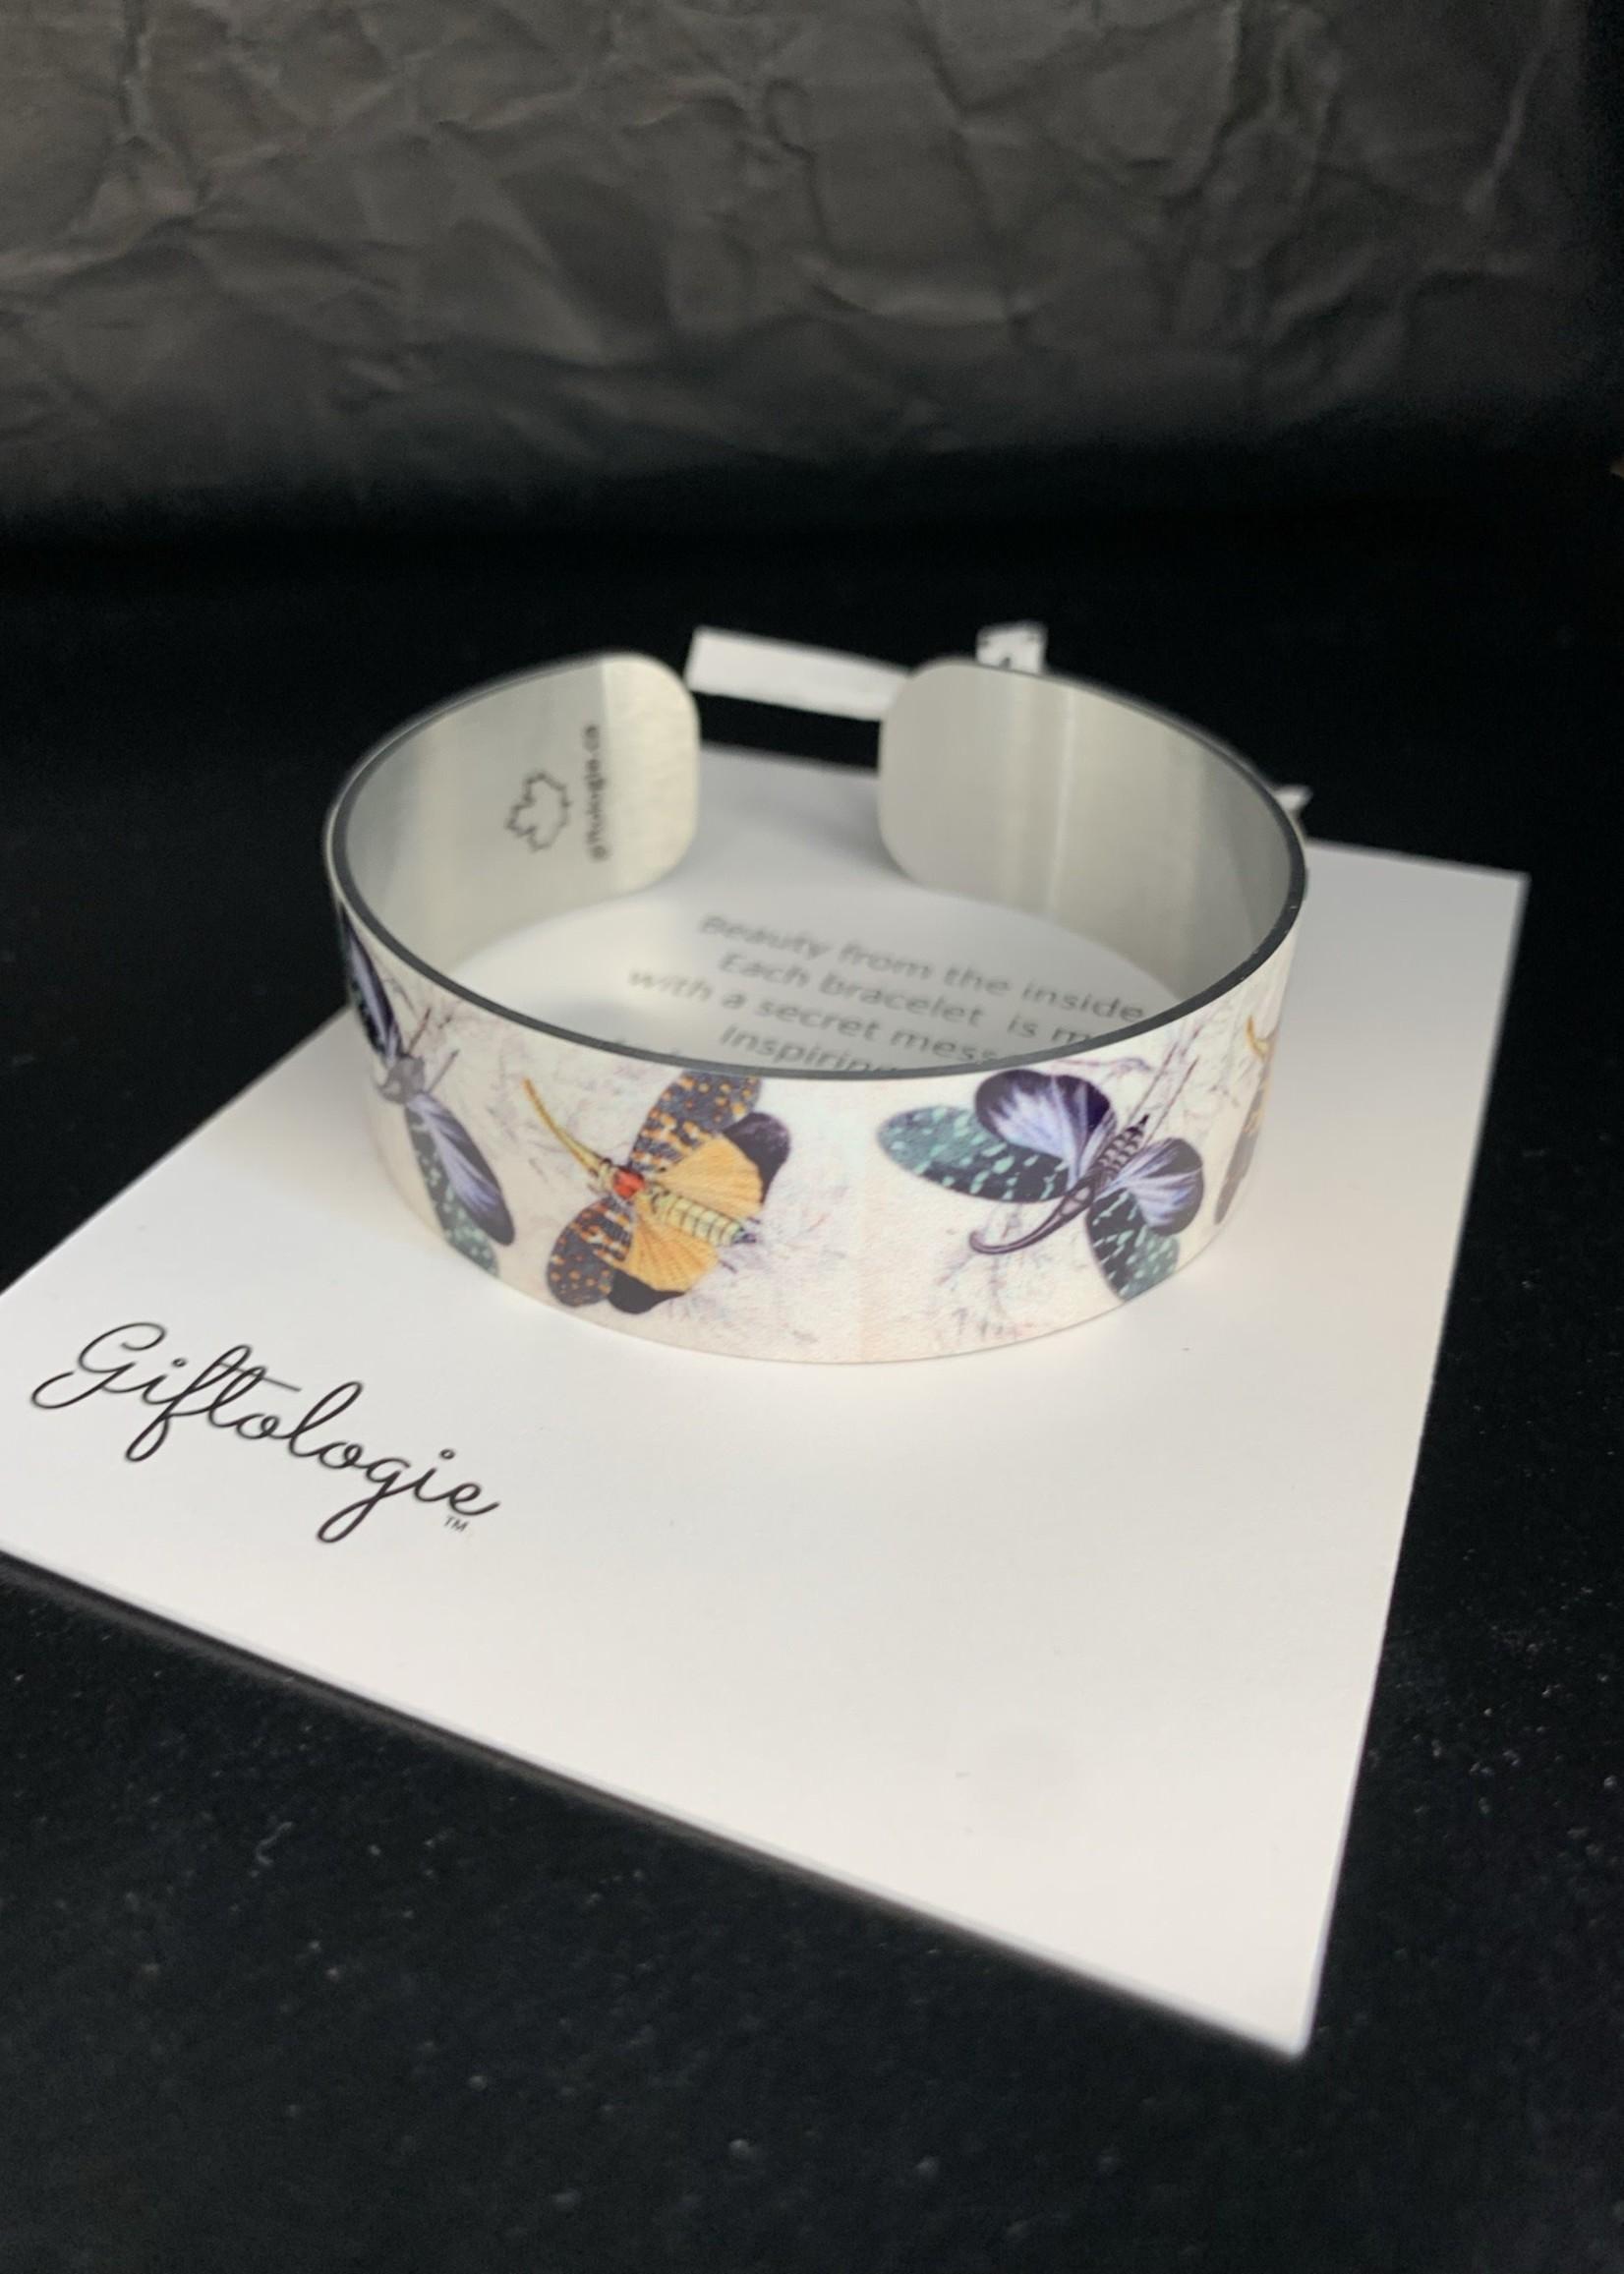 Giftologie Giftologie - Papillon Statement Cuff